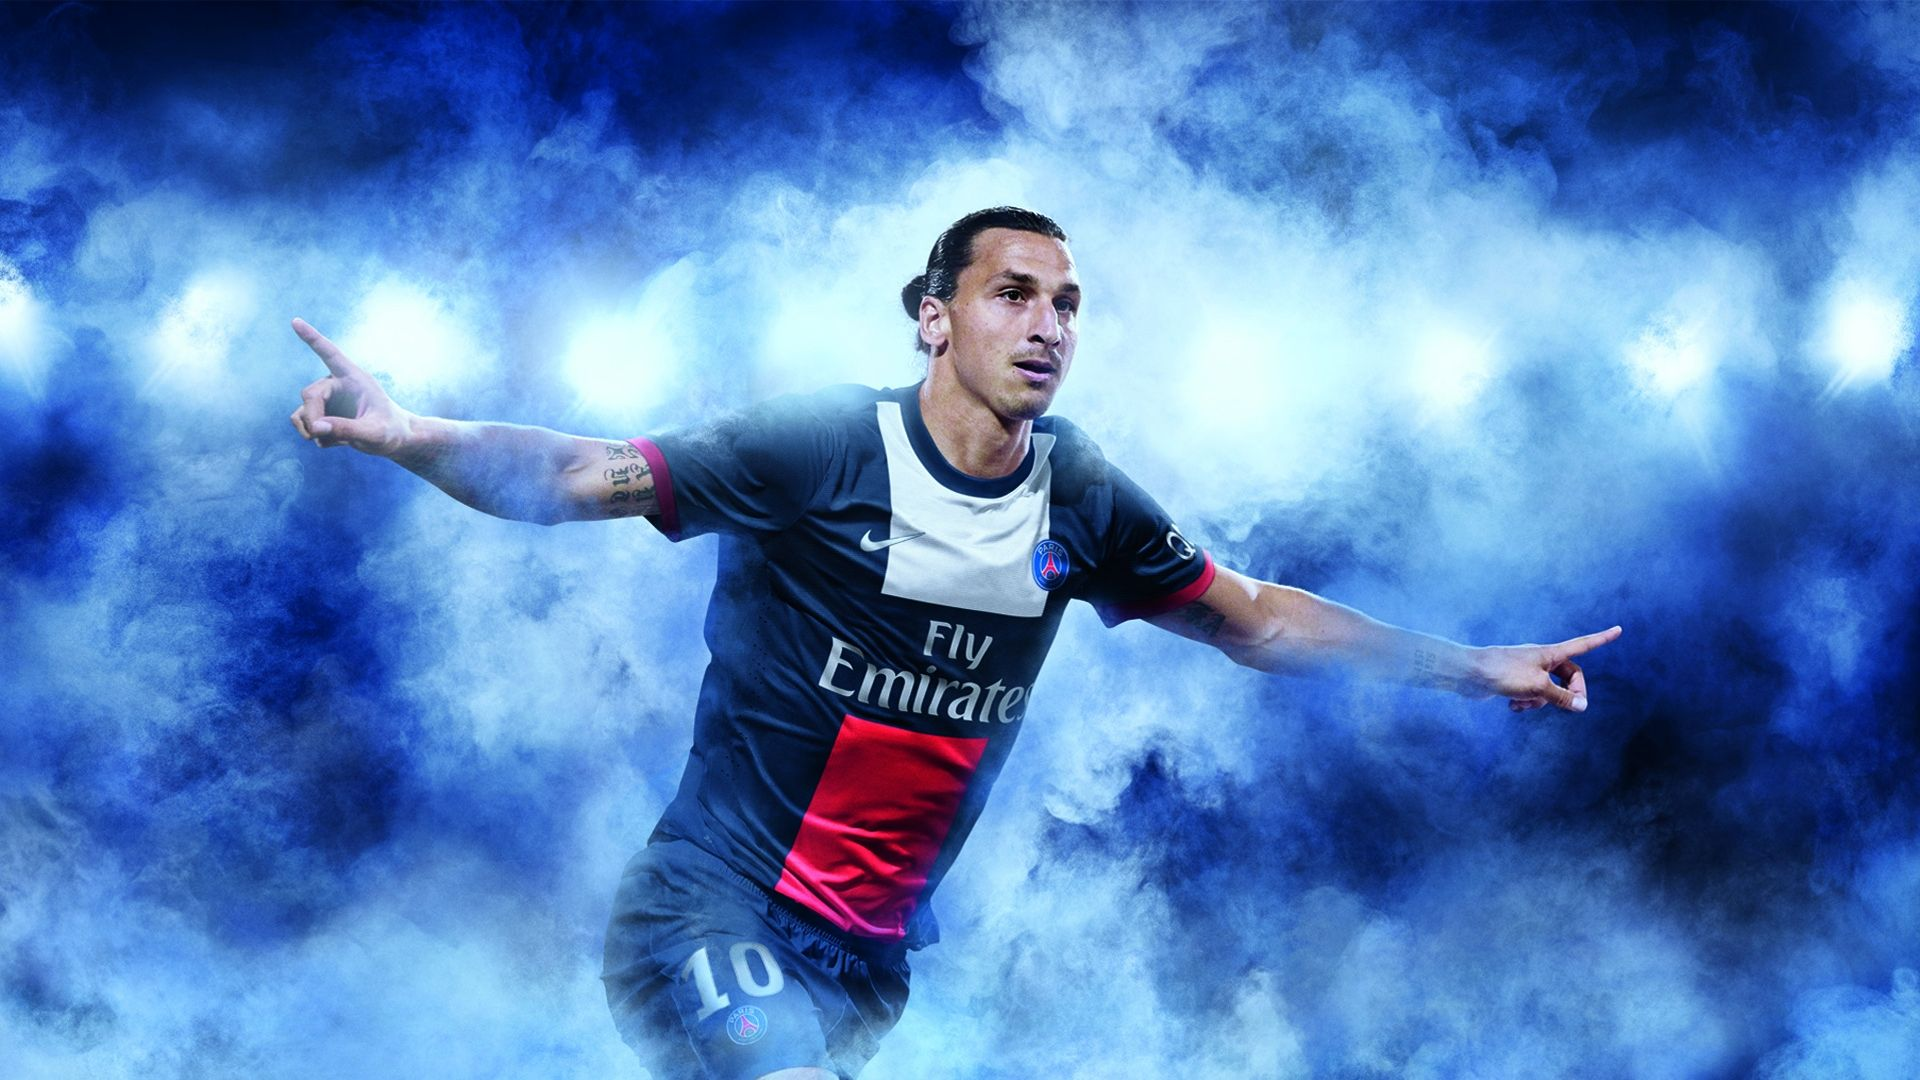 Zalatan Ibrahimovic PSG Wallpaper